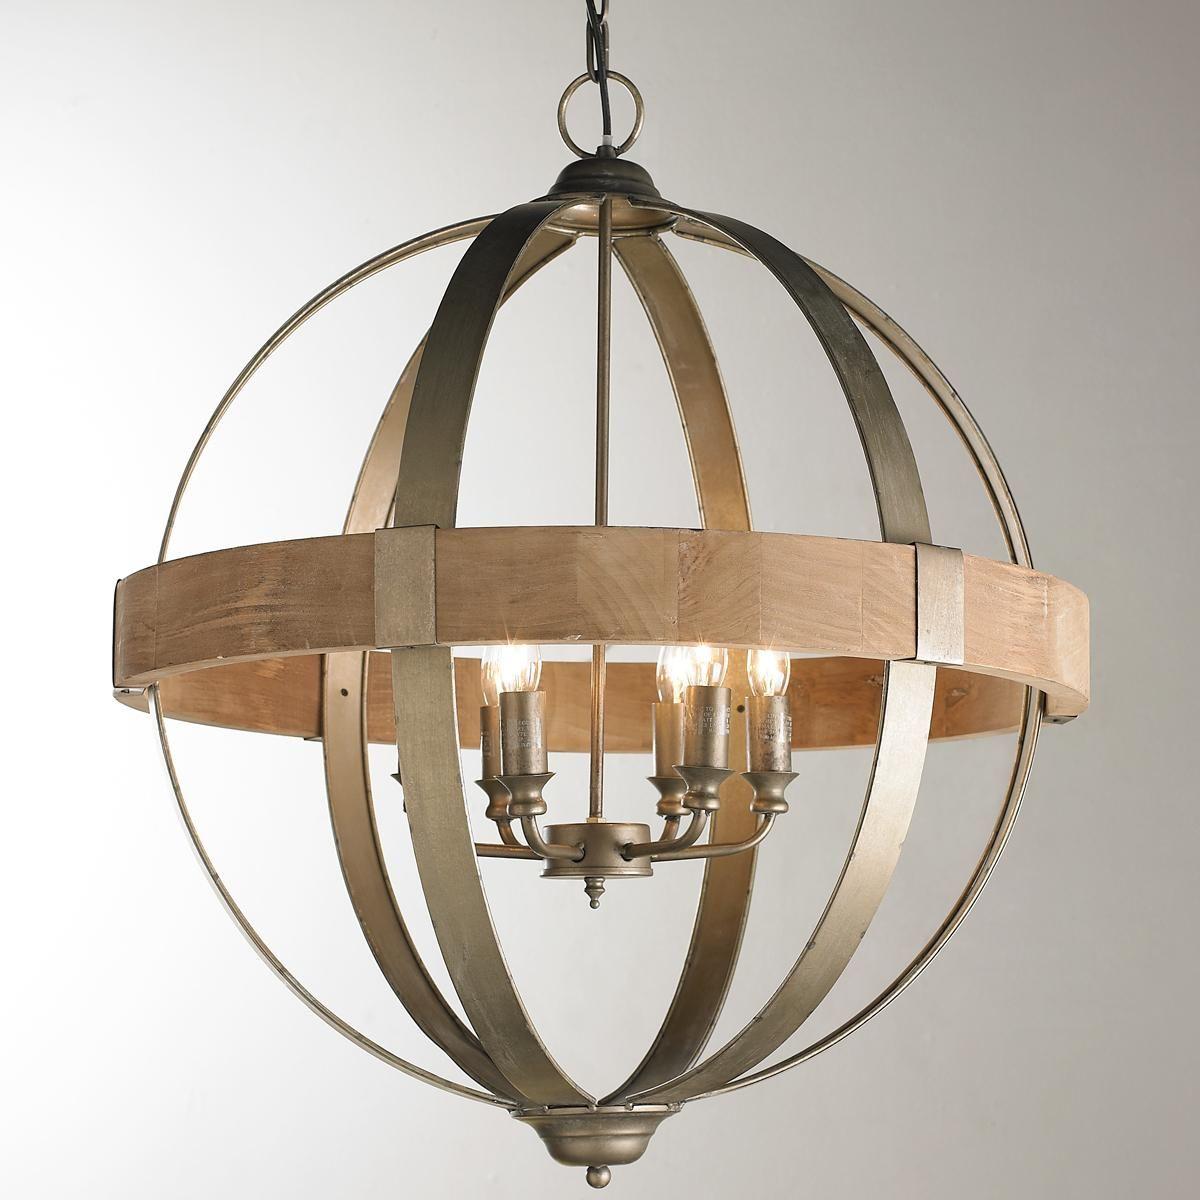 Modern Chandelier Lighting Globe 4 Lights Wood Ceiling: Metal And Wood Globe Chandelier - 6-Light